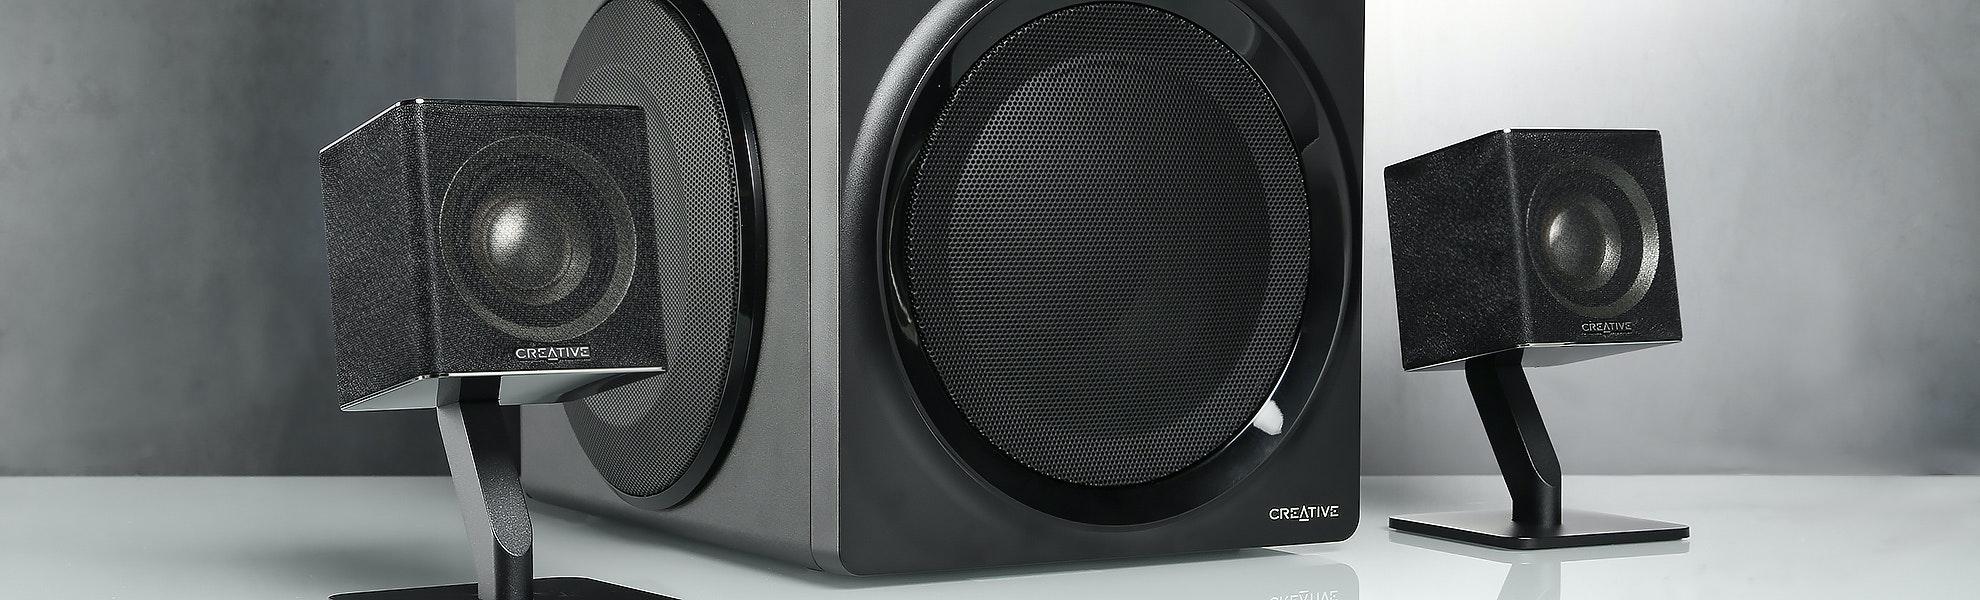 Creative T4 Wireless Bluetooth Speaker System